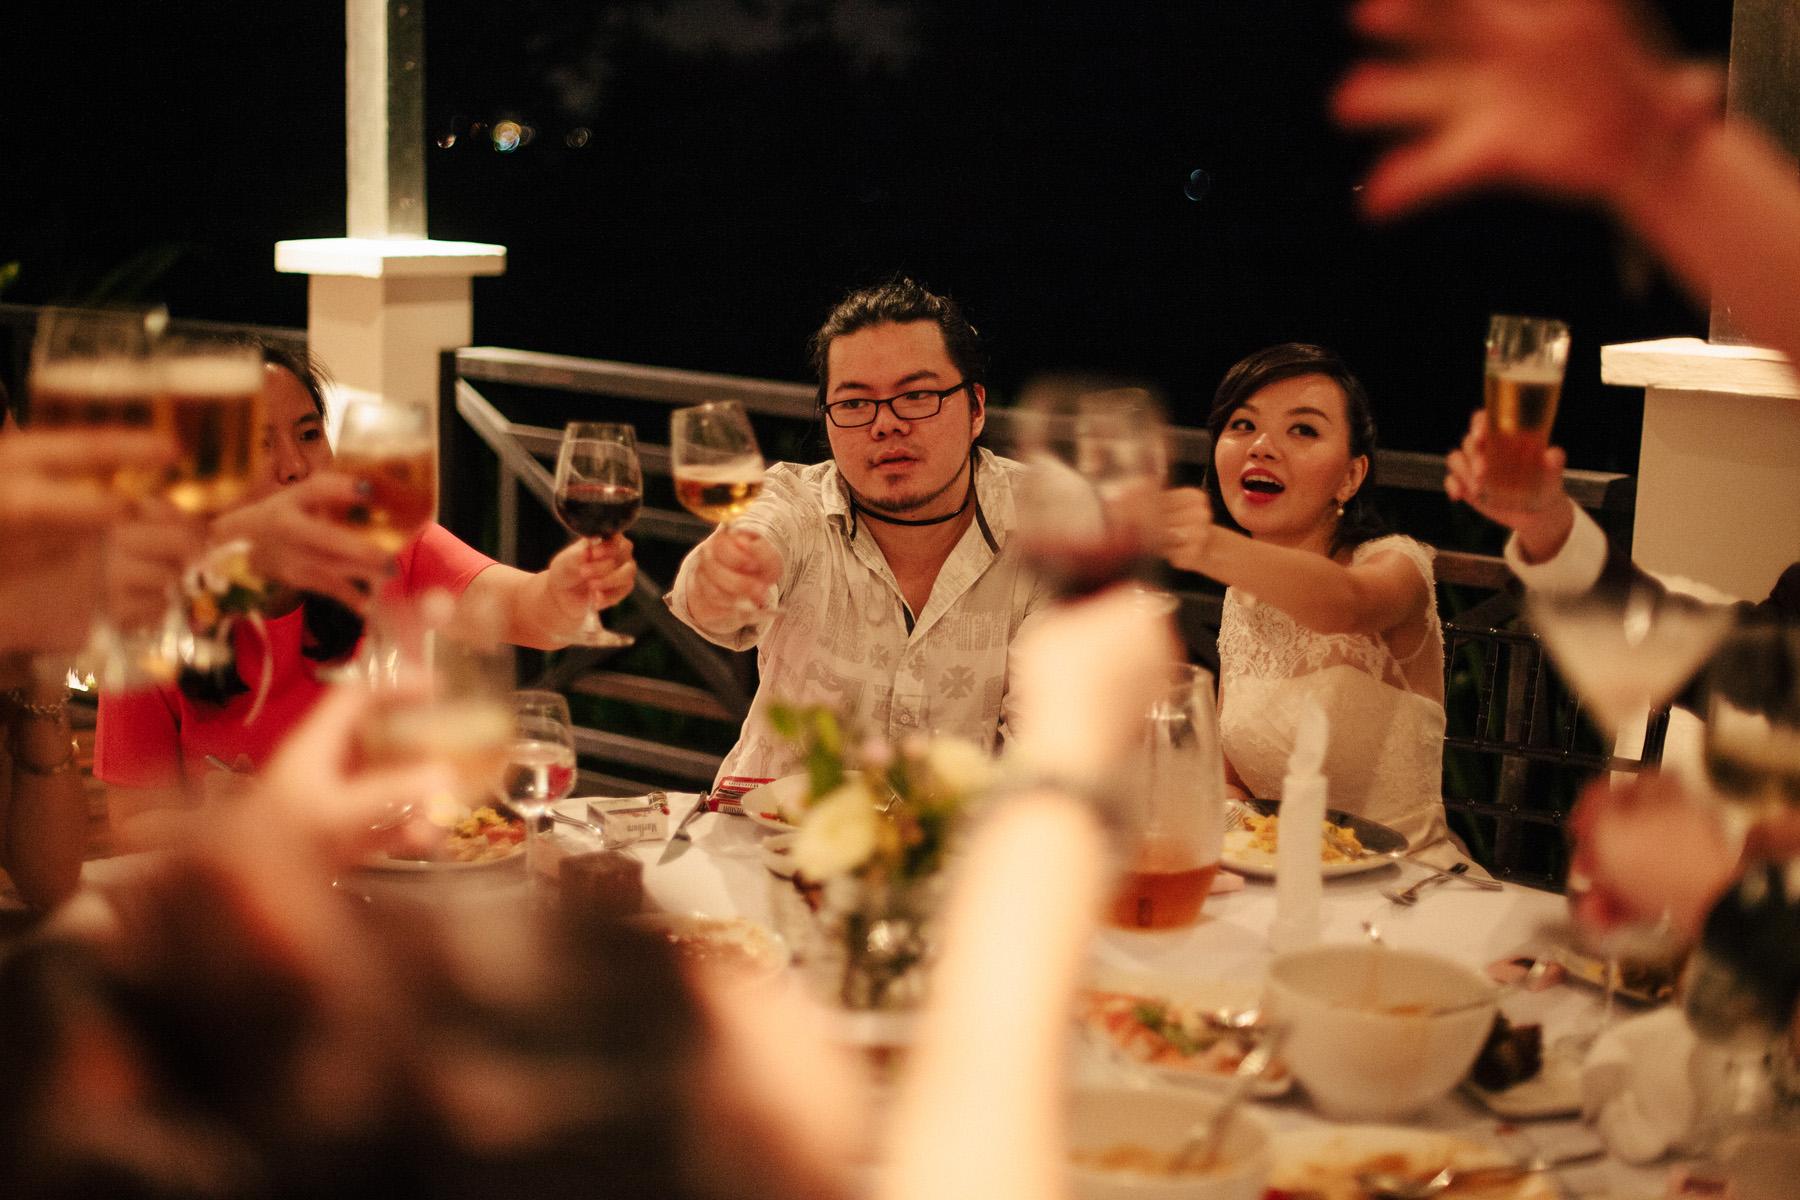 singapore-wedding-travel-photographer-faith-alvin-wedding-wmt-53.jpg